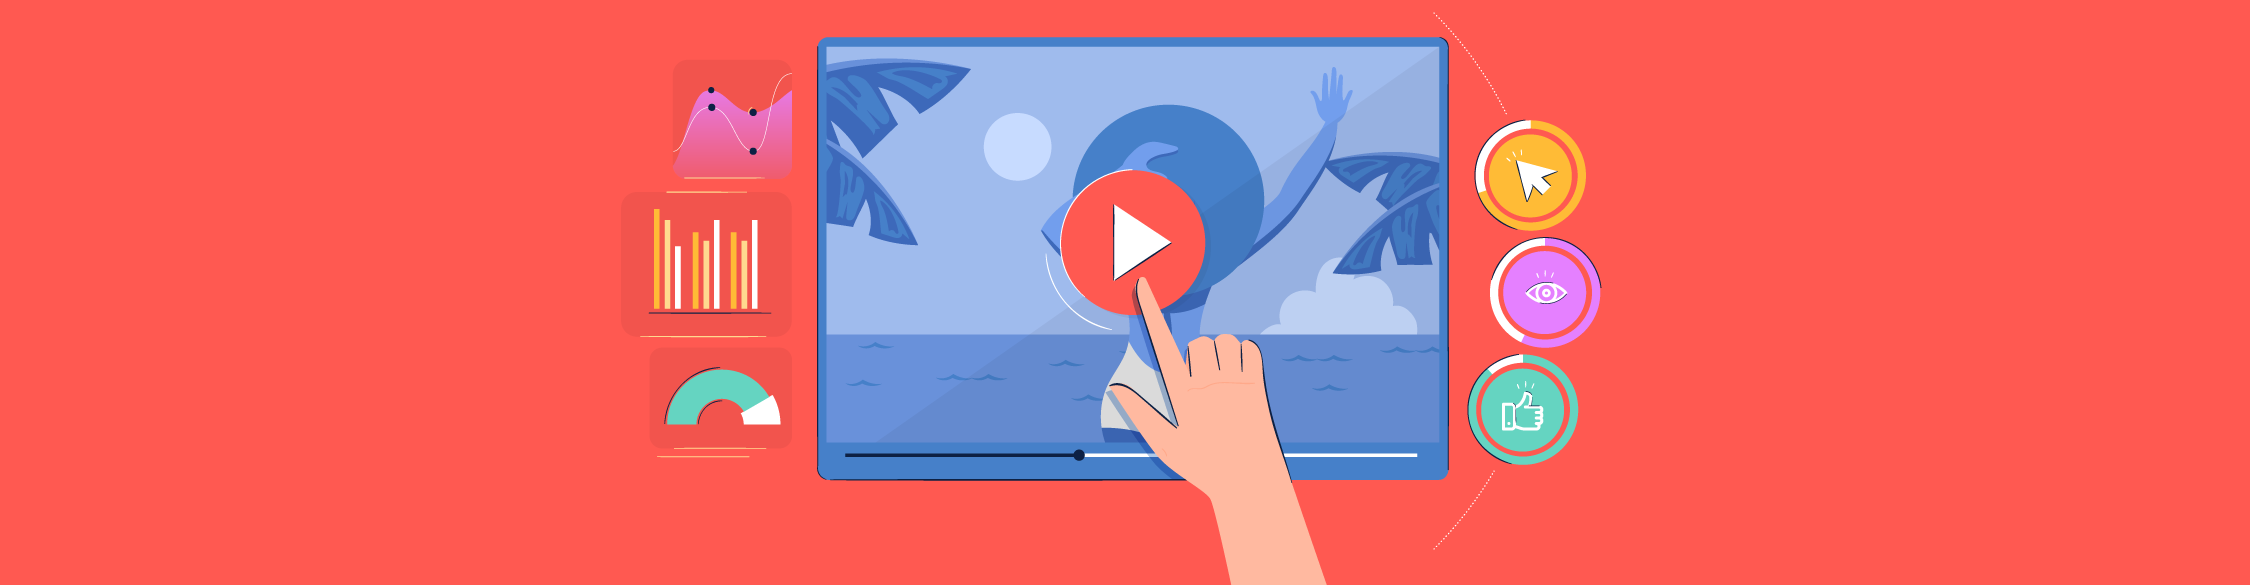 video marketing statistics - header